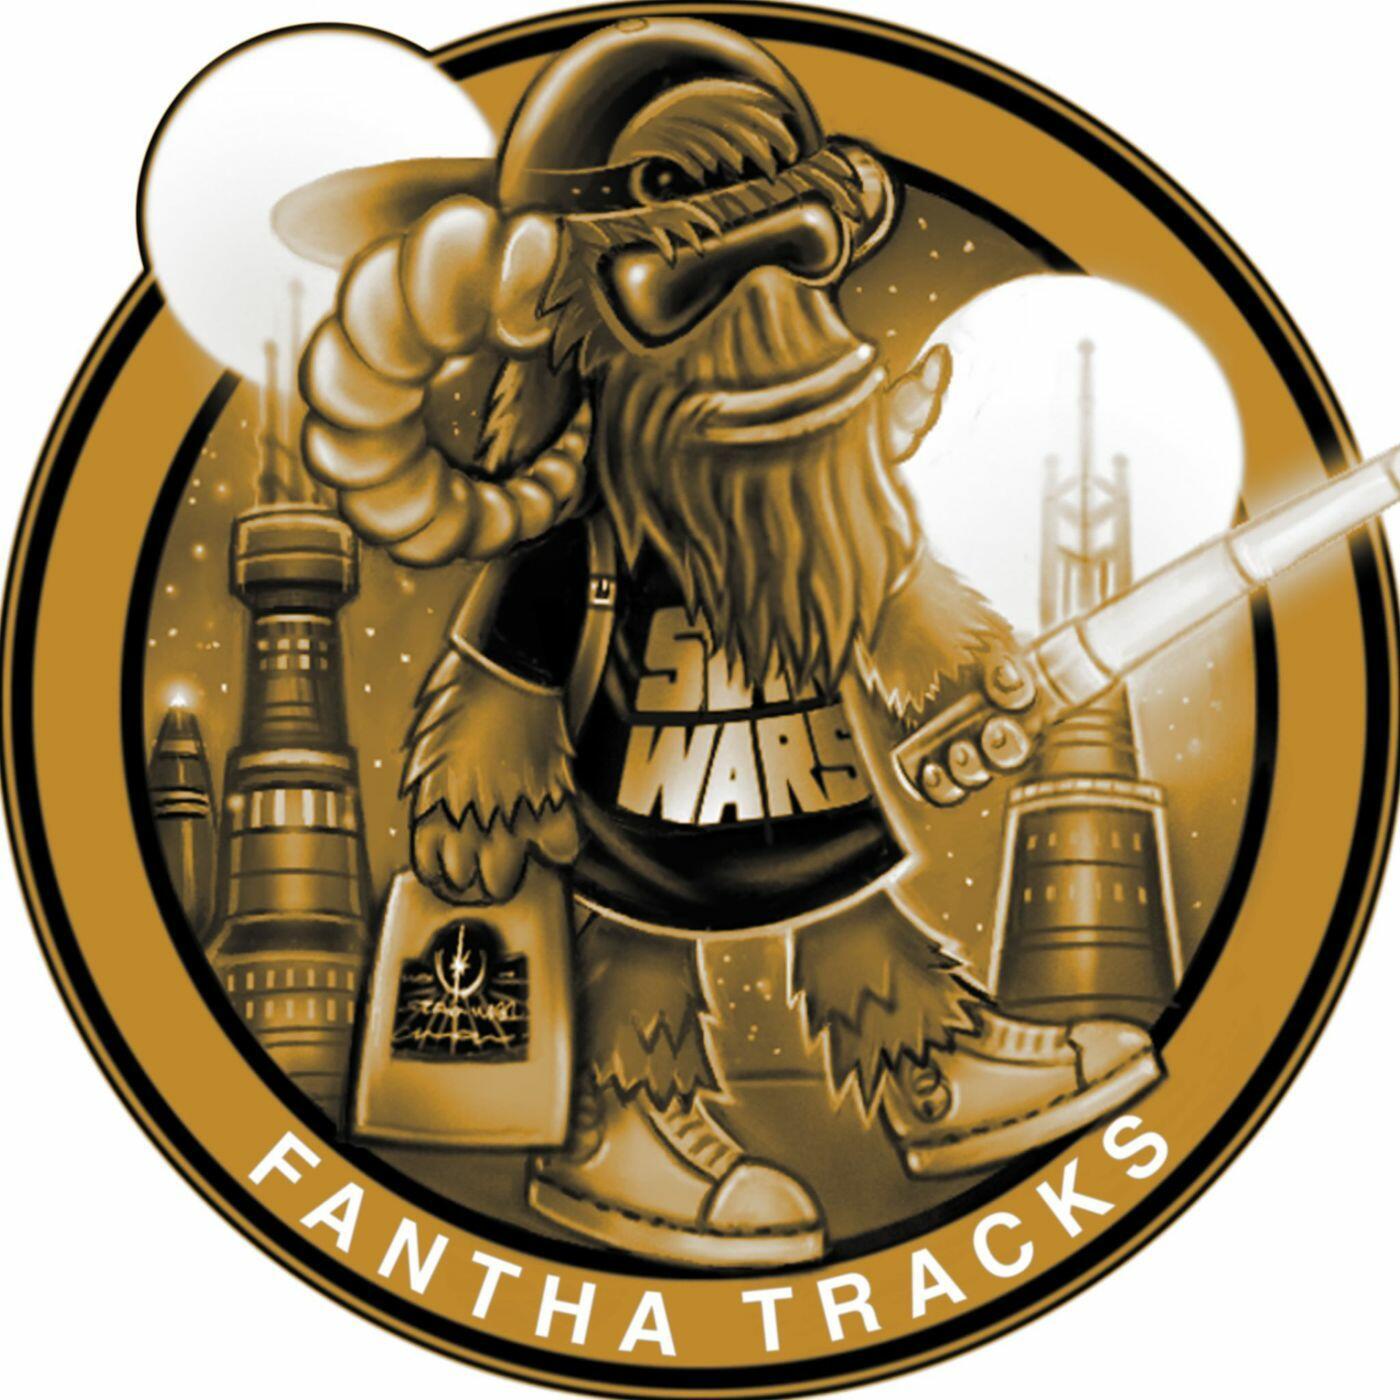 Fantha Tracks Radio: A Star Wars Podcast